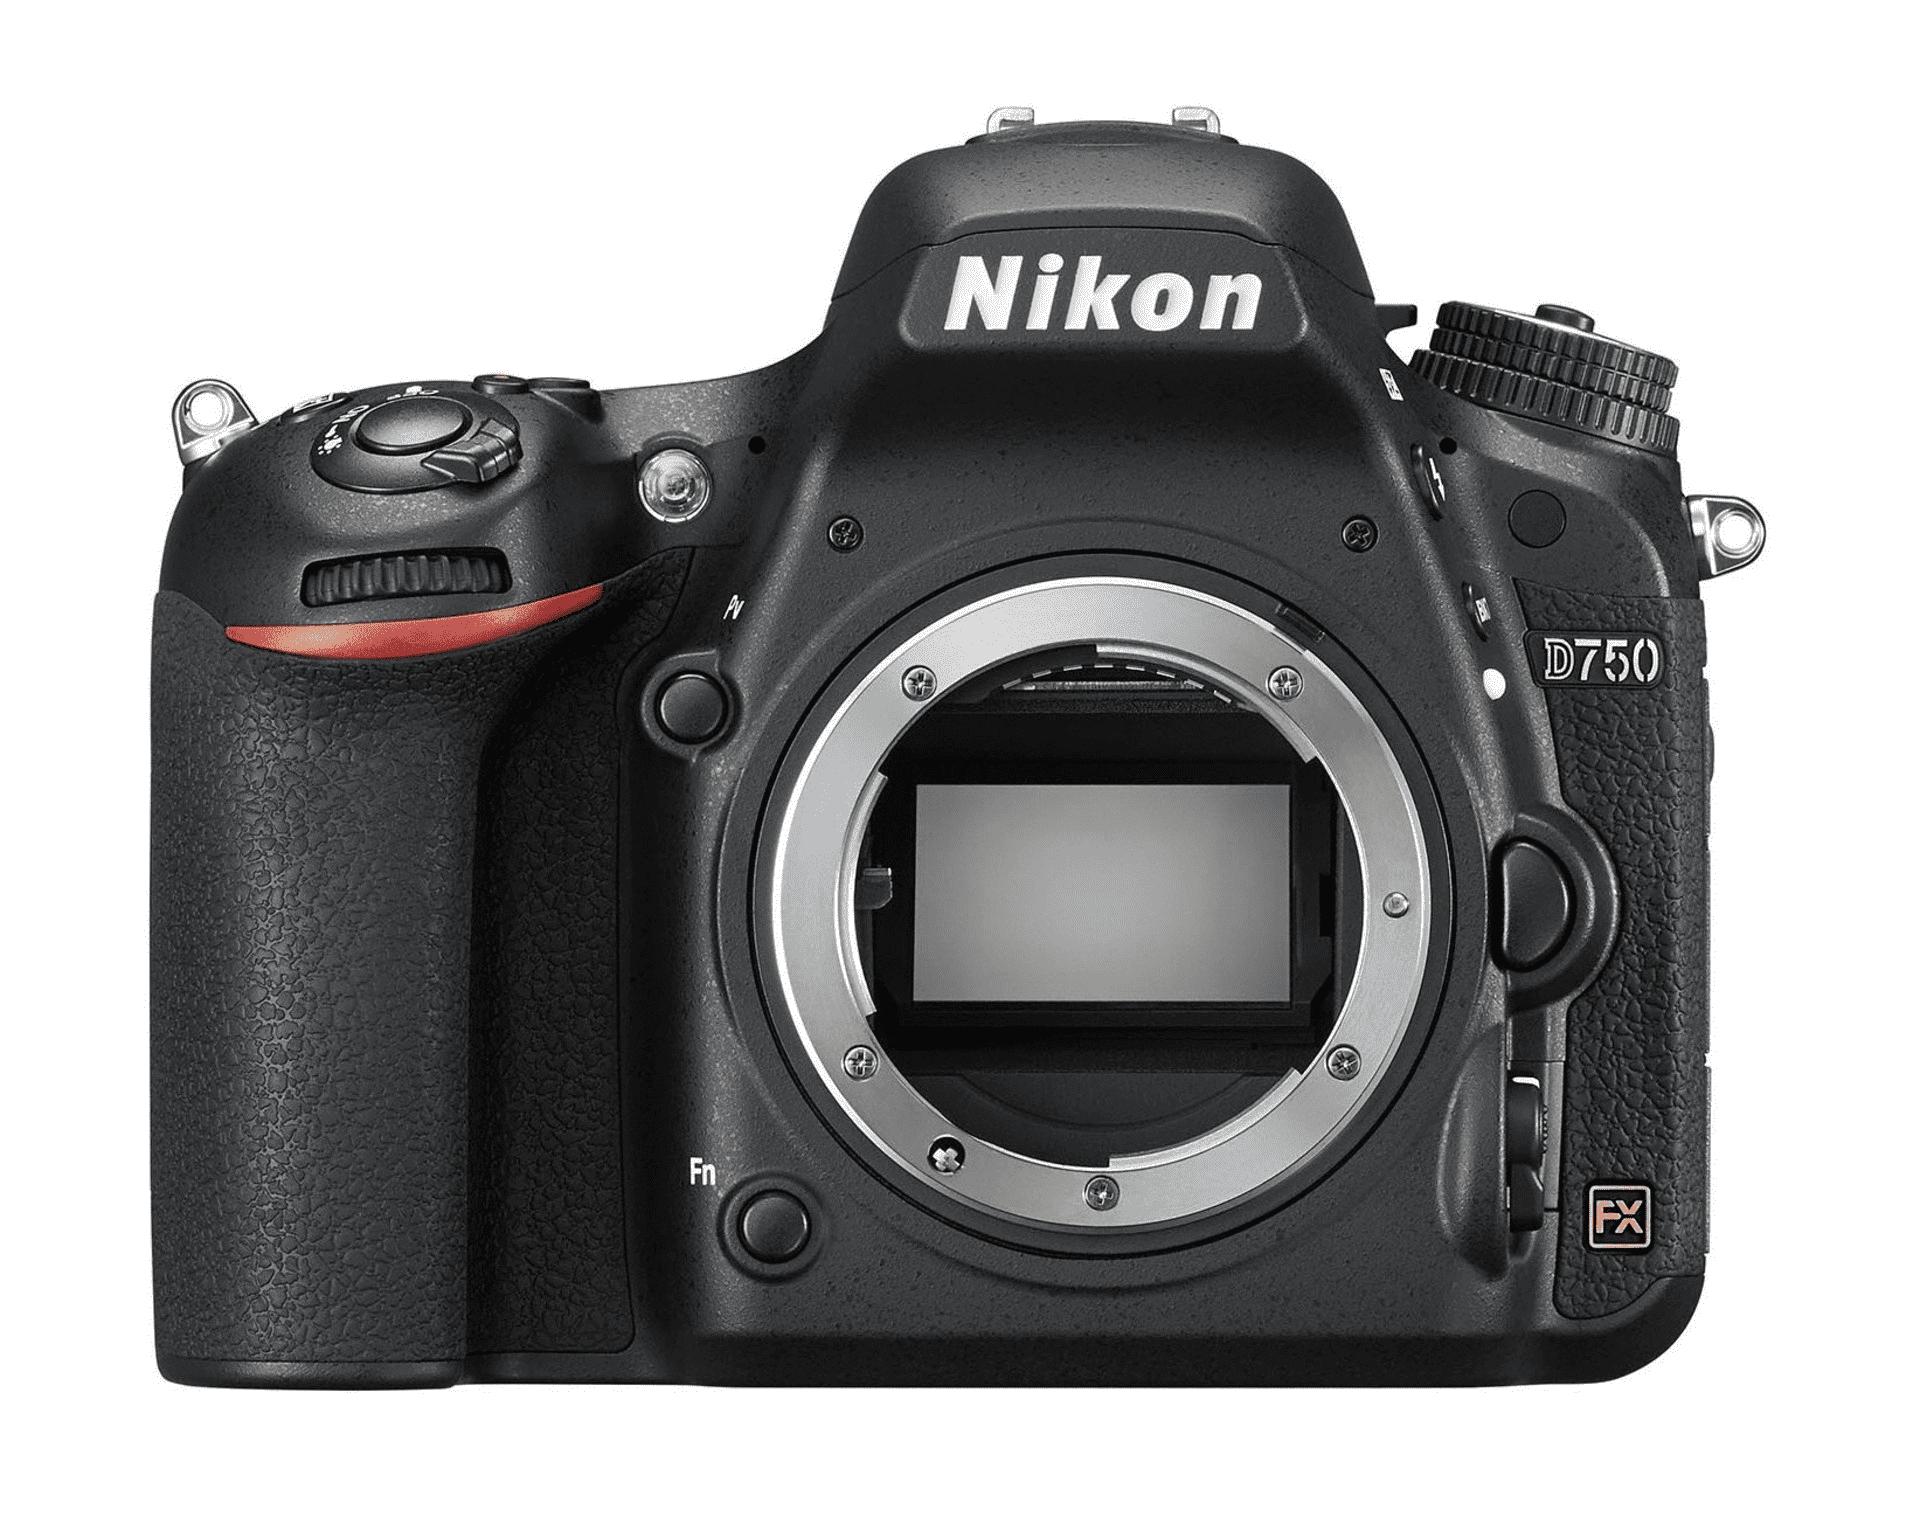 Appareil photo reflex Nikon D750 - Wi-Fi, Full Frame, 24.3 Mpx (Boitier nu)